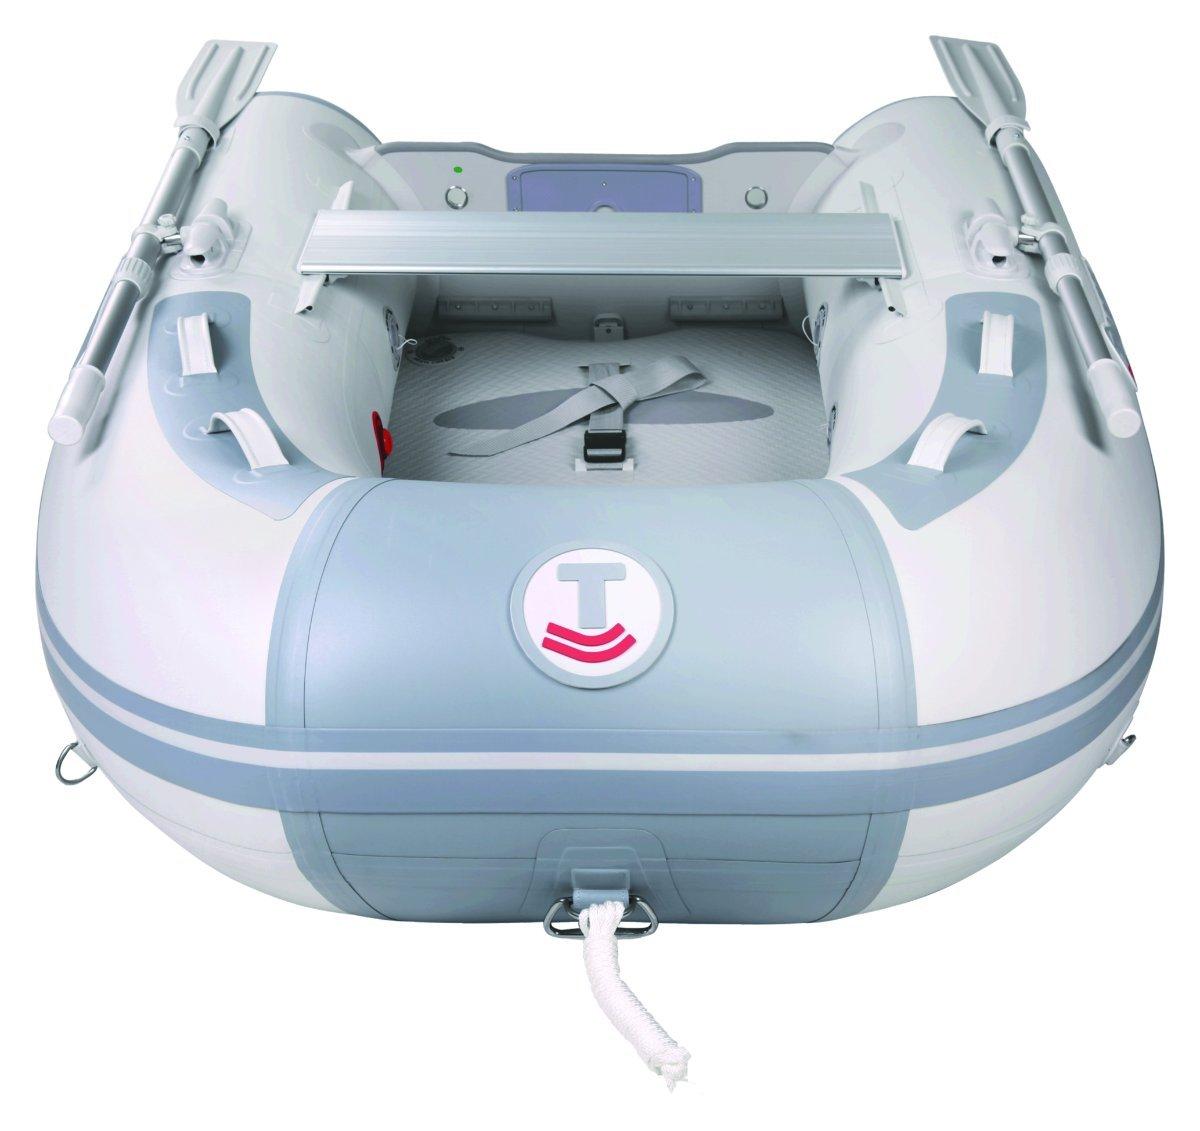 Talamex Highline x-light 250 Air Floor Inflatable Boat